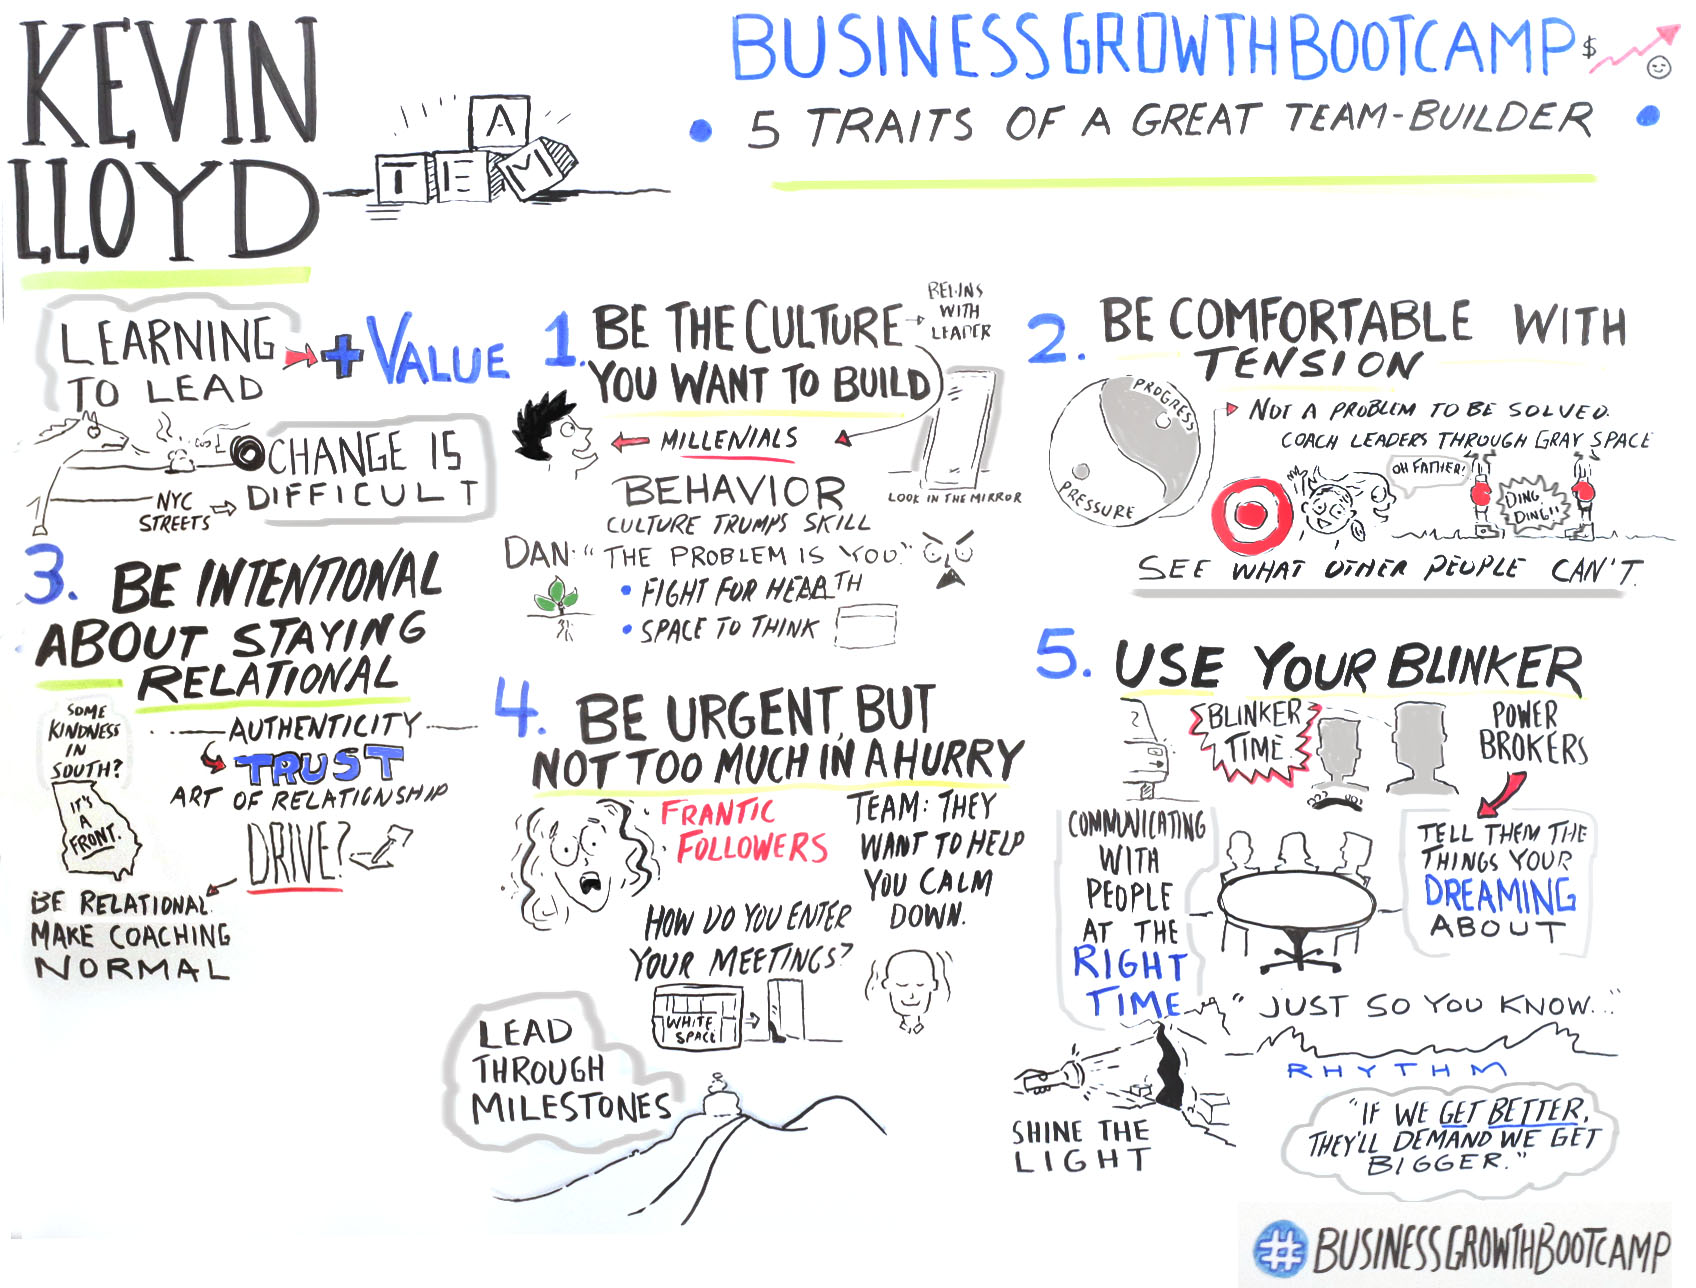 Kevin Lloyd - Business Growth Bootcamp